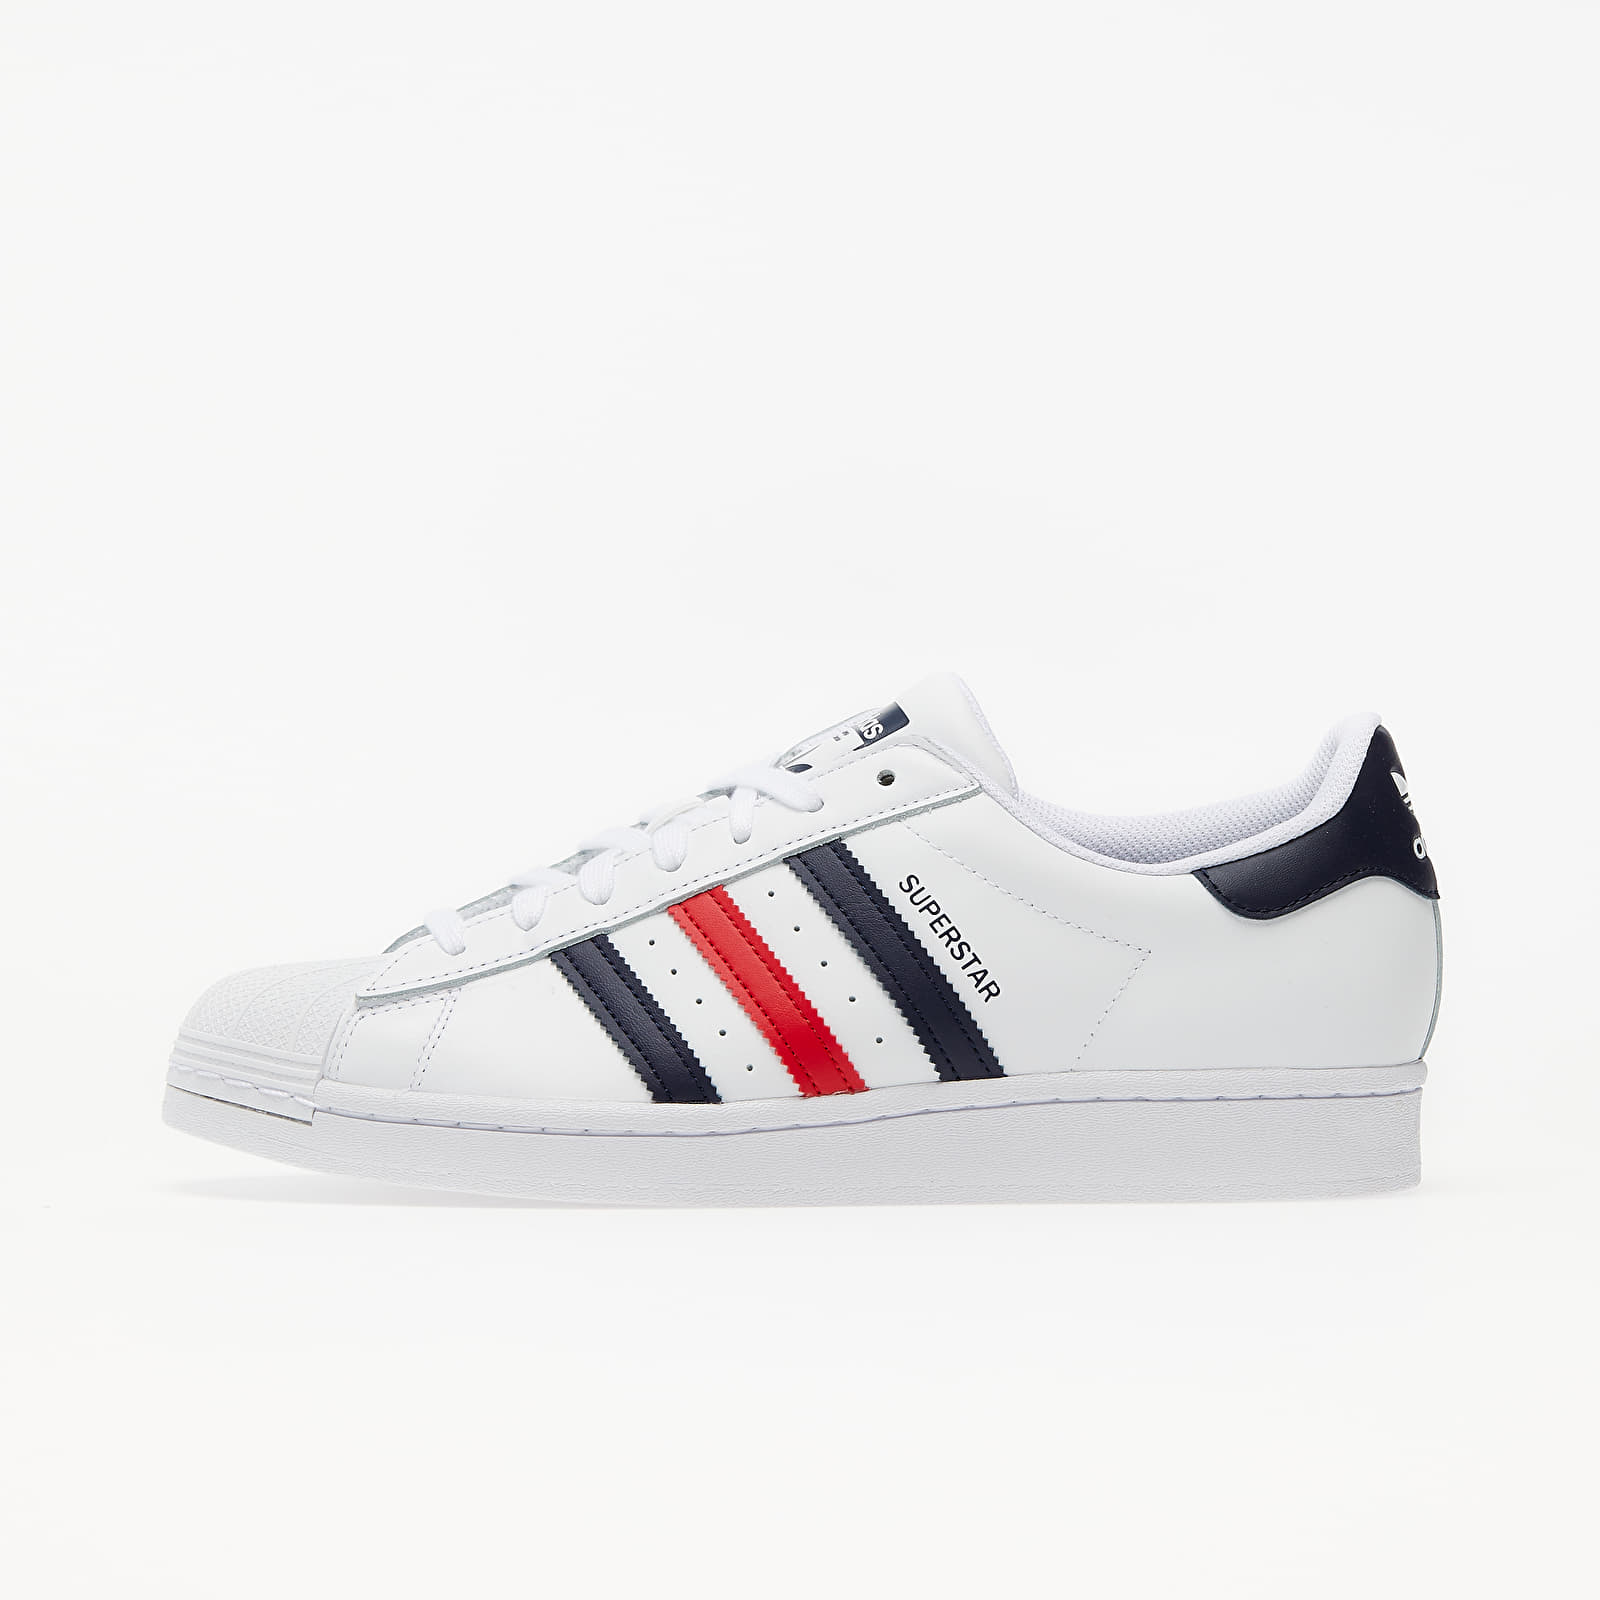 Men's shoes adidas Superstar Ftw White/ Scarlet/ Ftw White